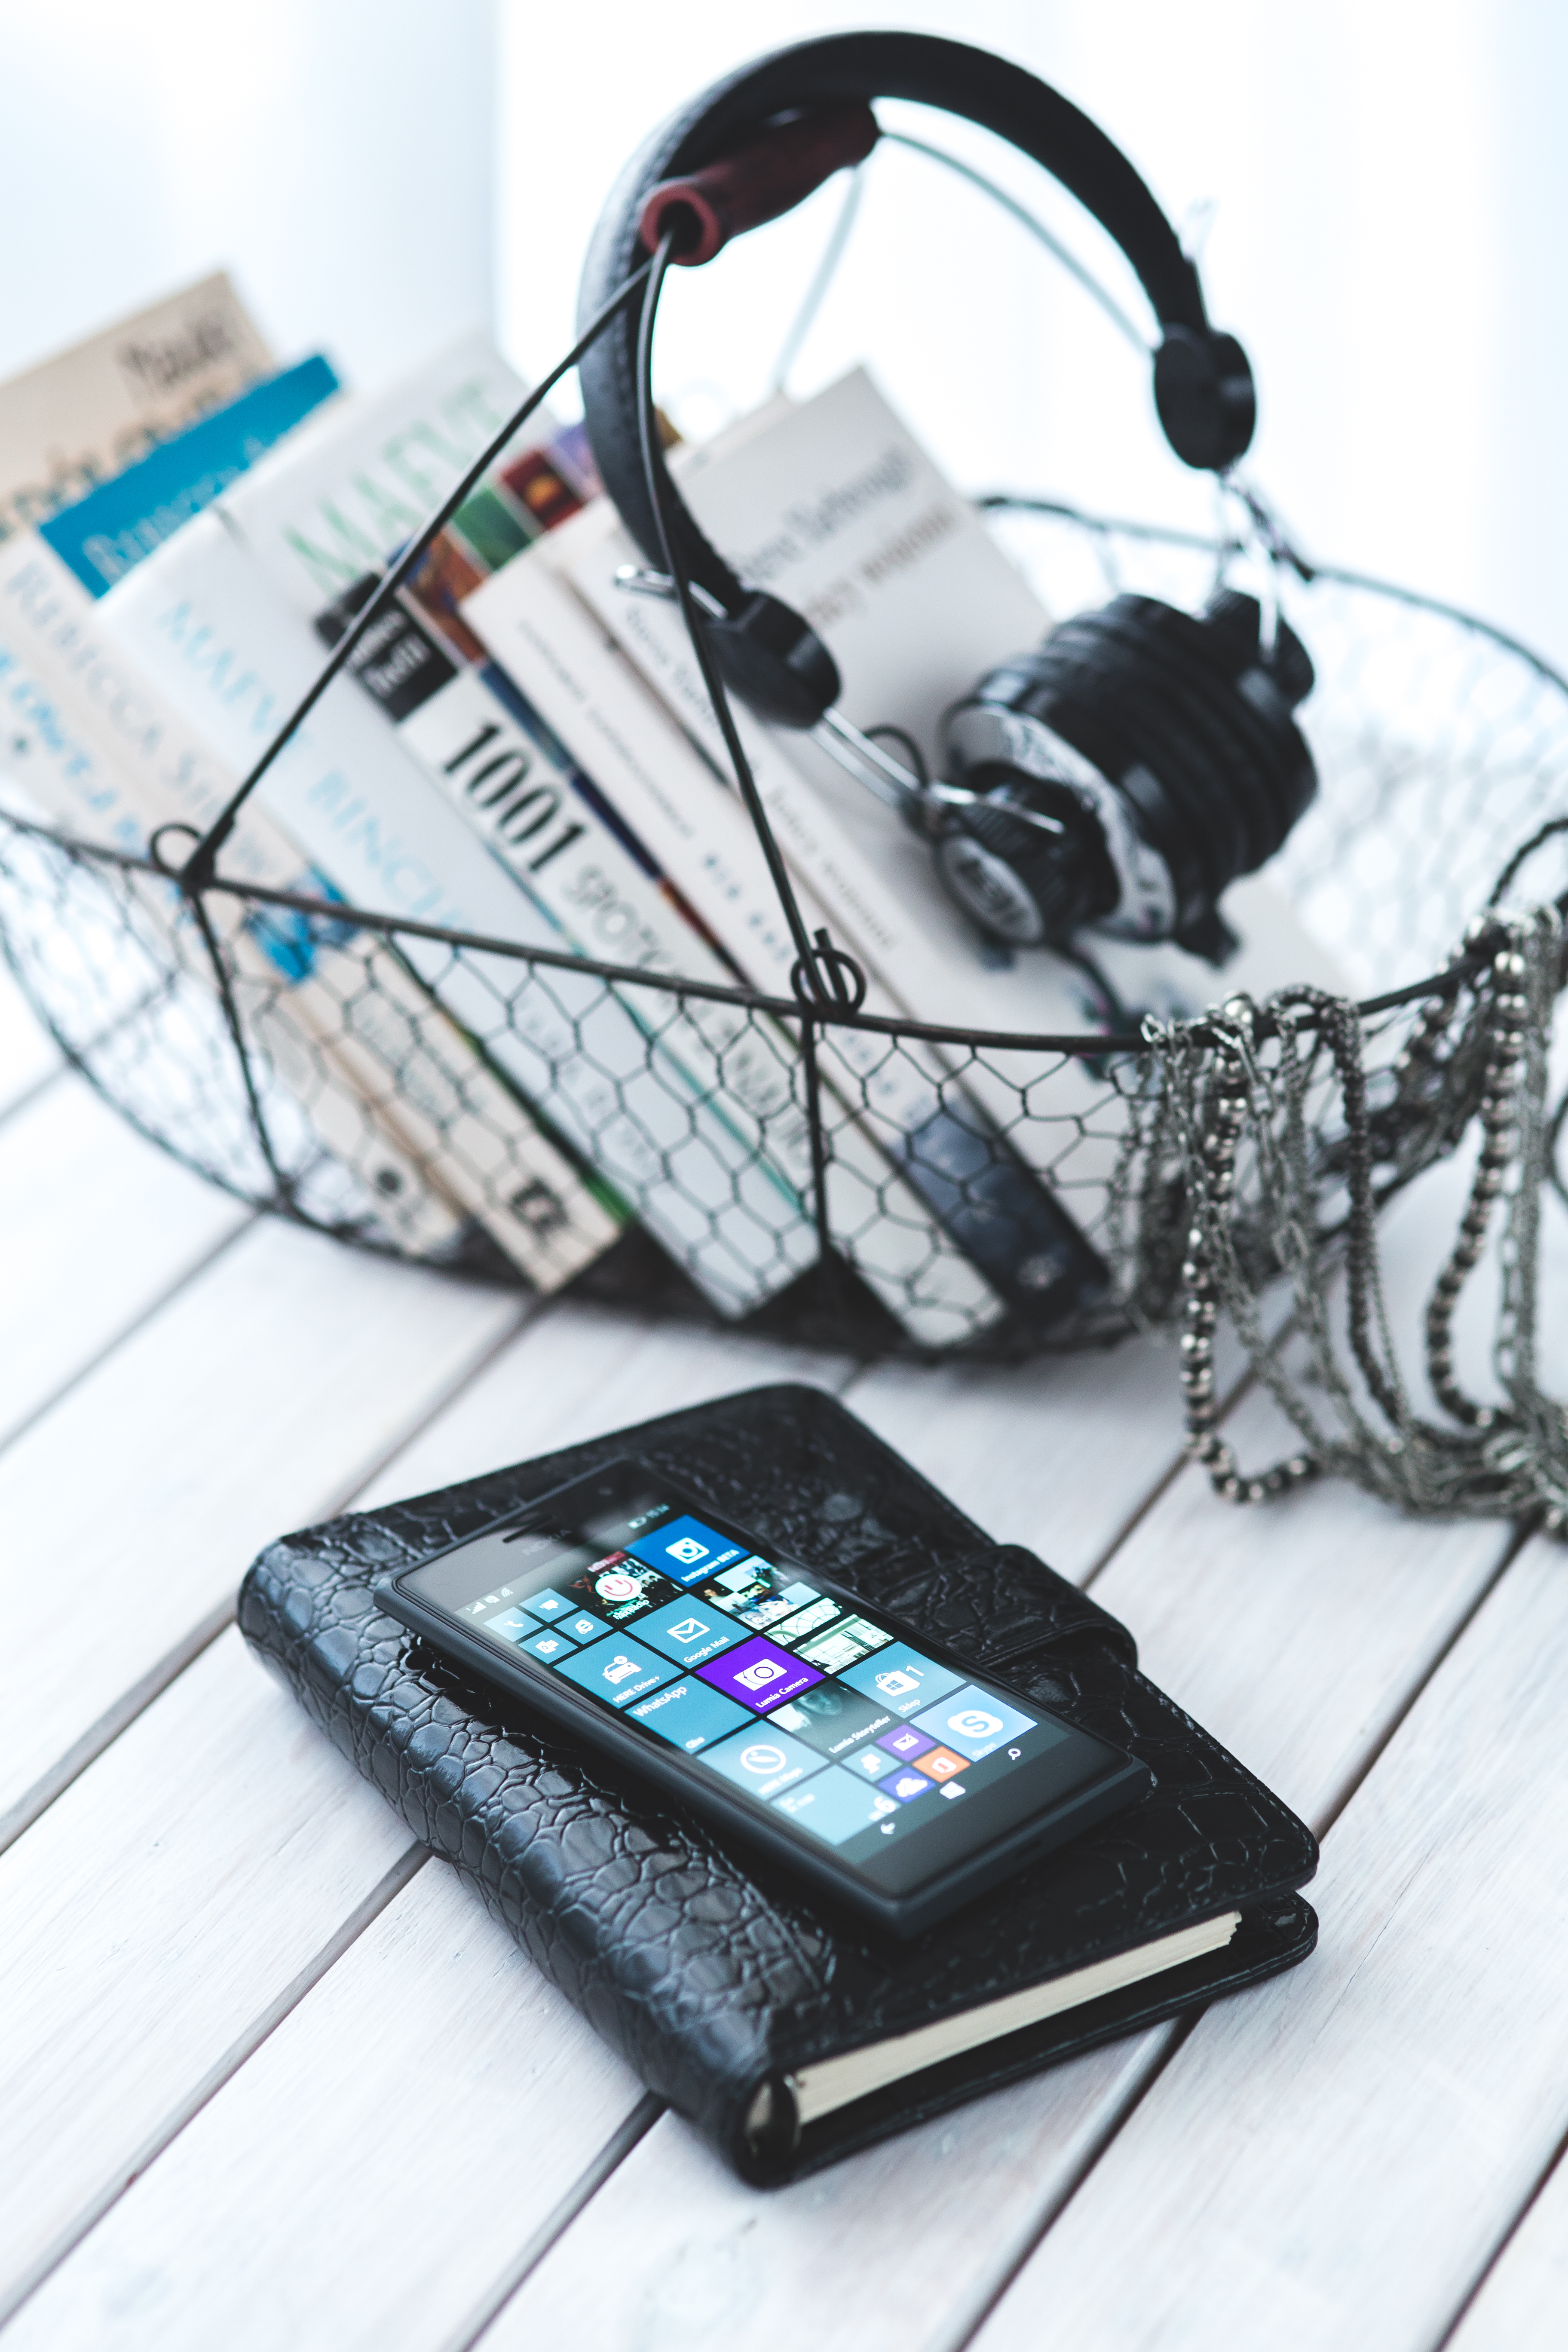 Mobile phone on a elegant black notebook